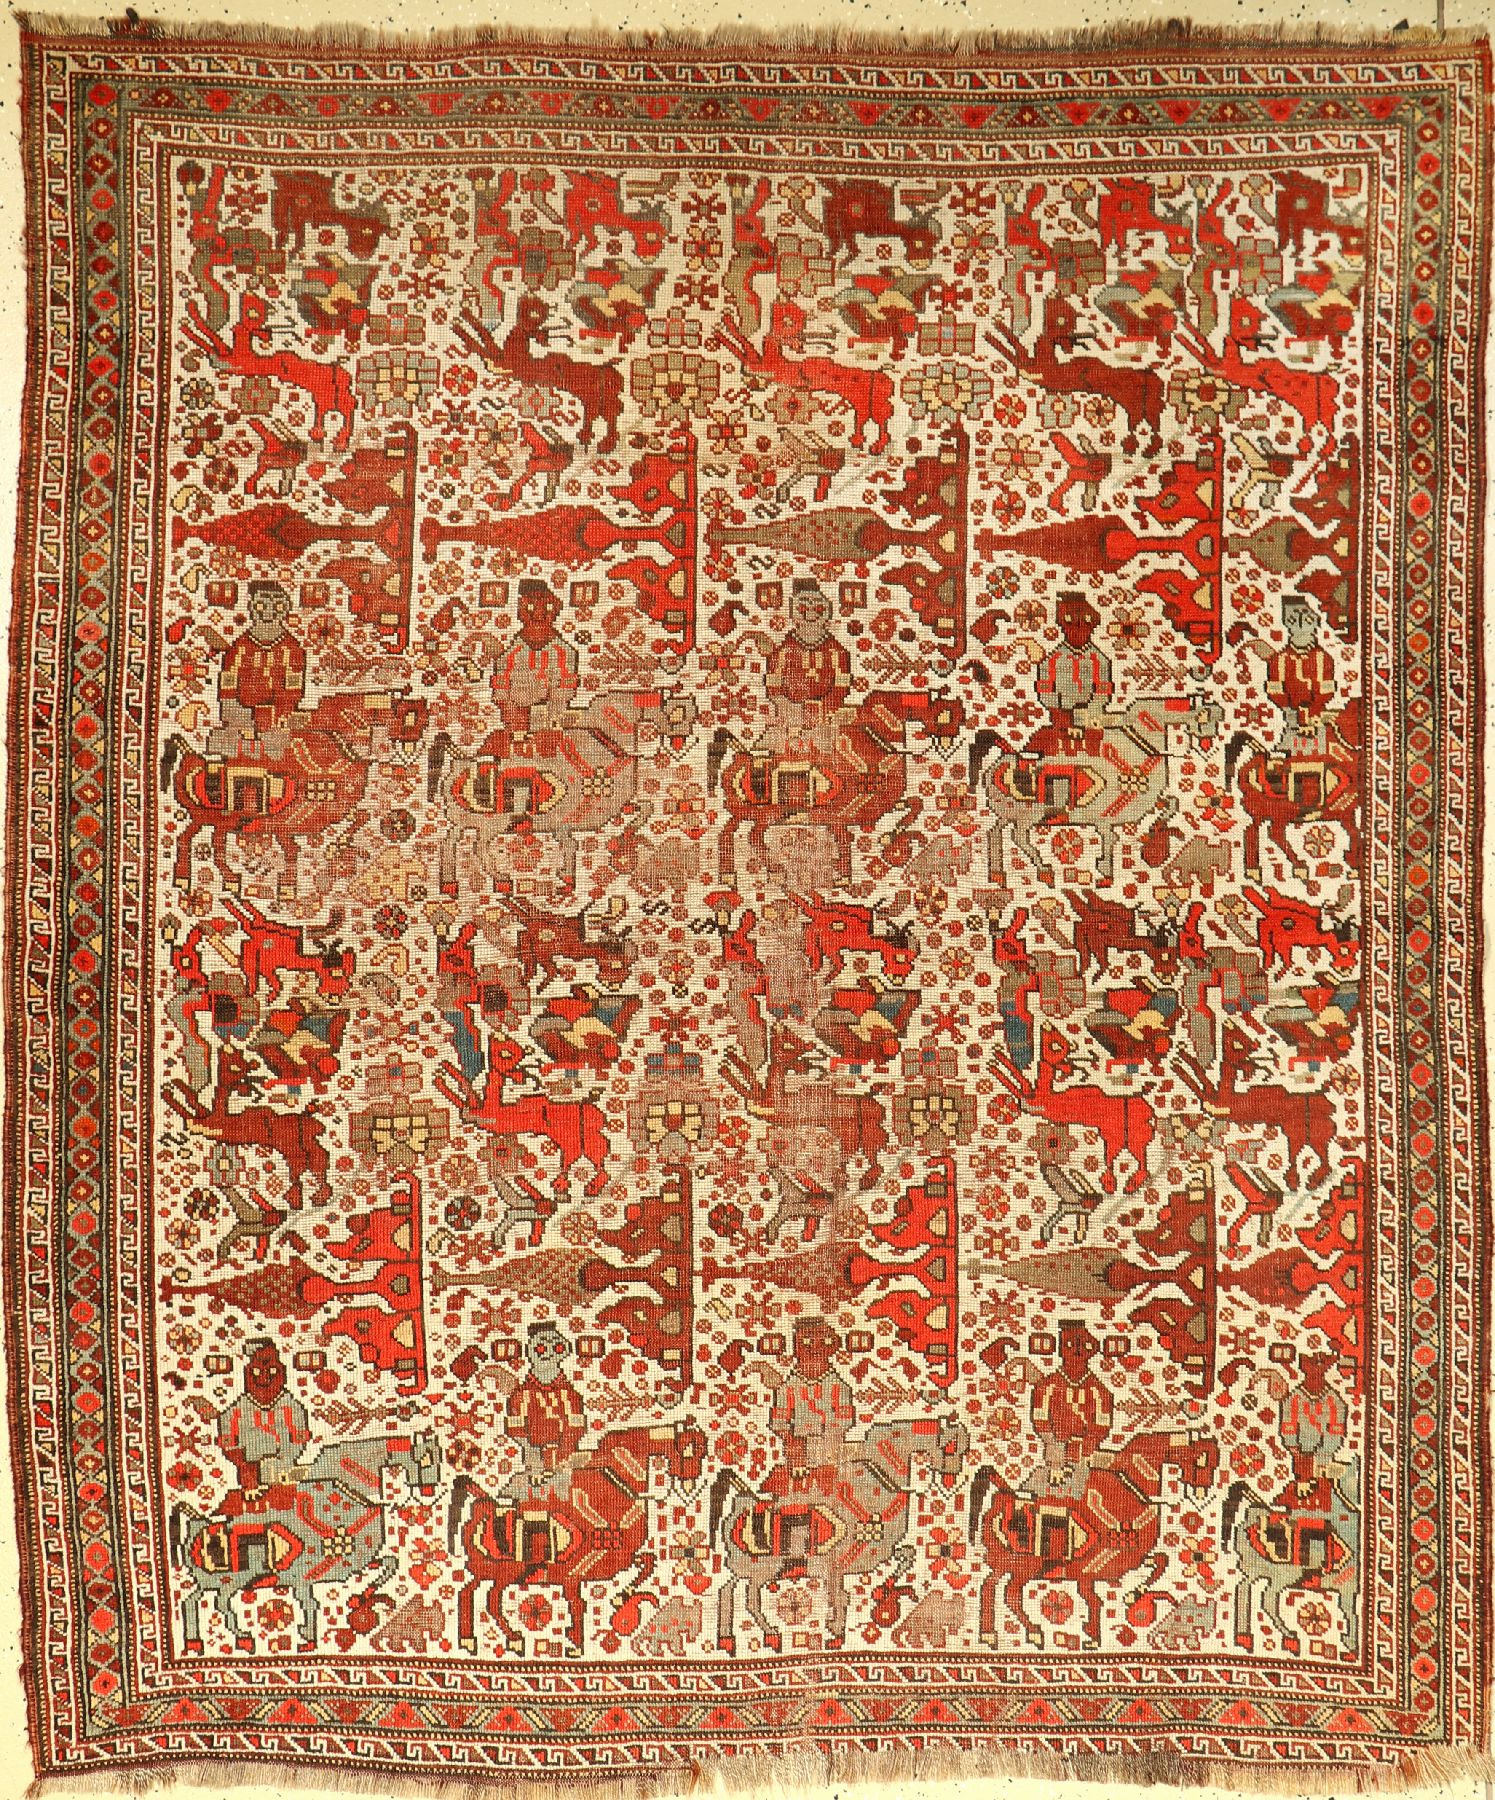 Antique Khamseh, Persia, late 19th century, wool on wool, approx. 188 x 160 cm, rare pattern type,